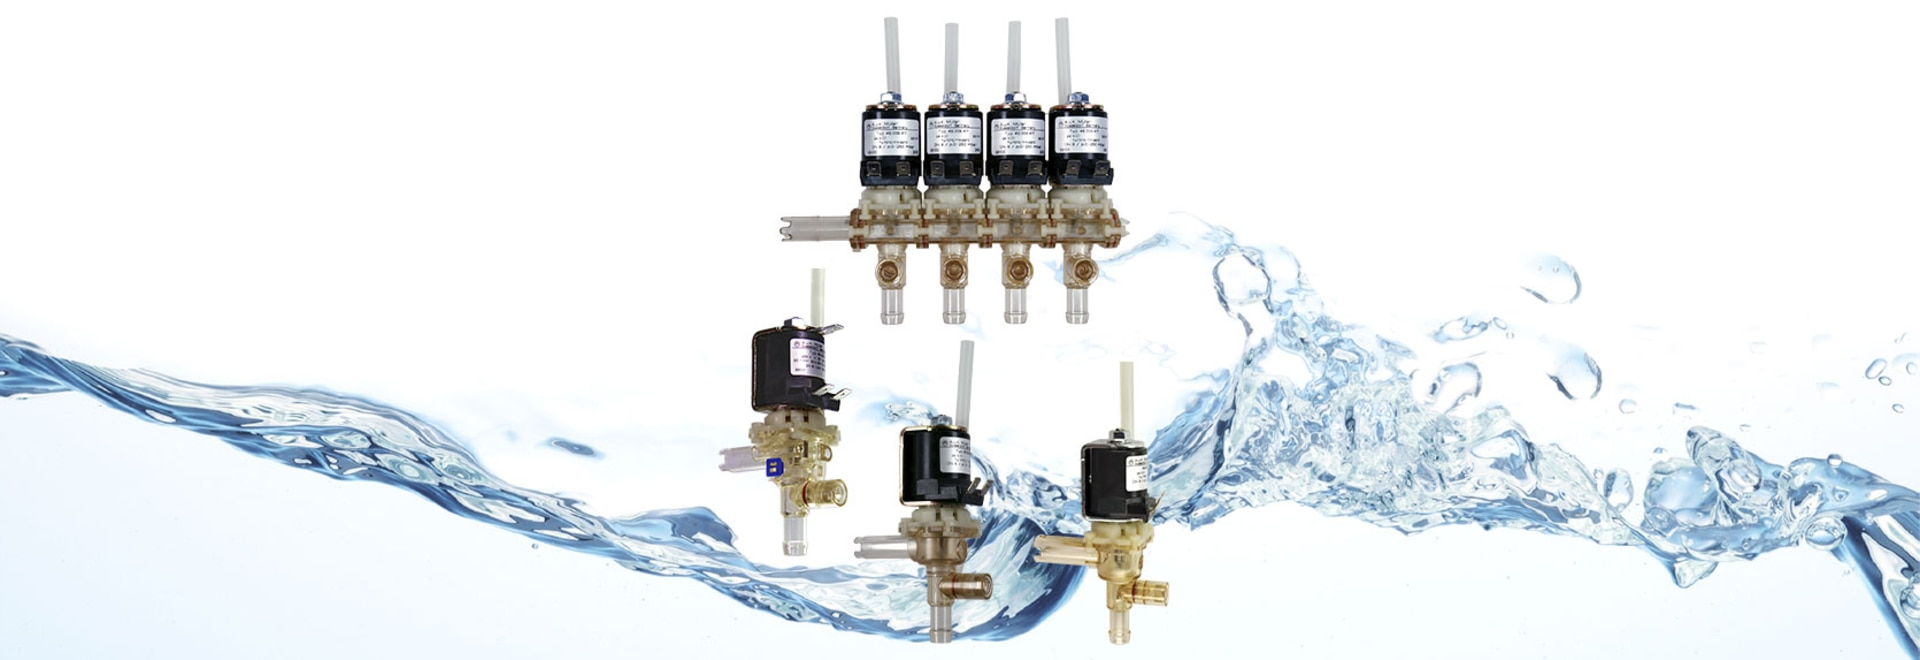 Media separated dispense valves